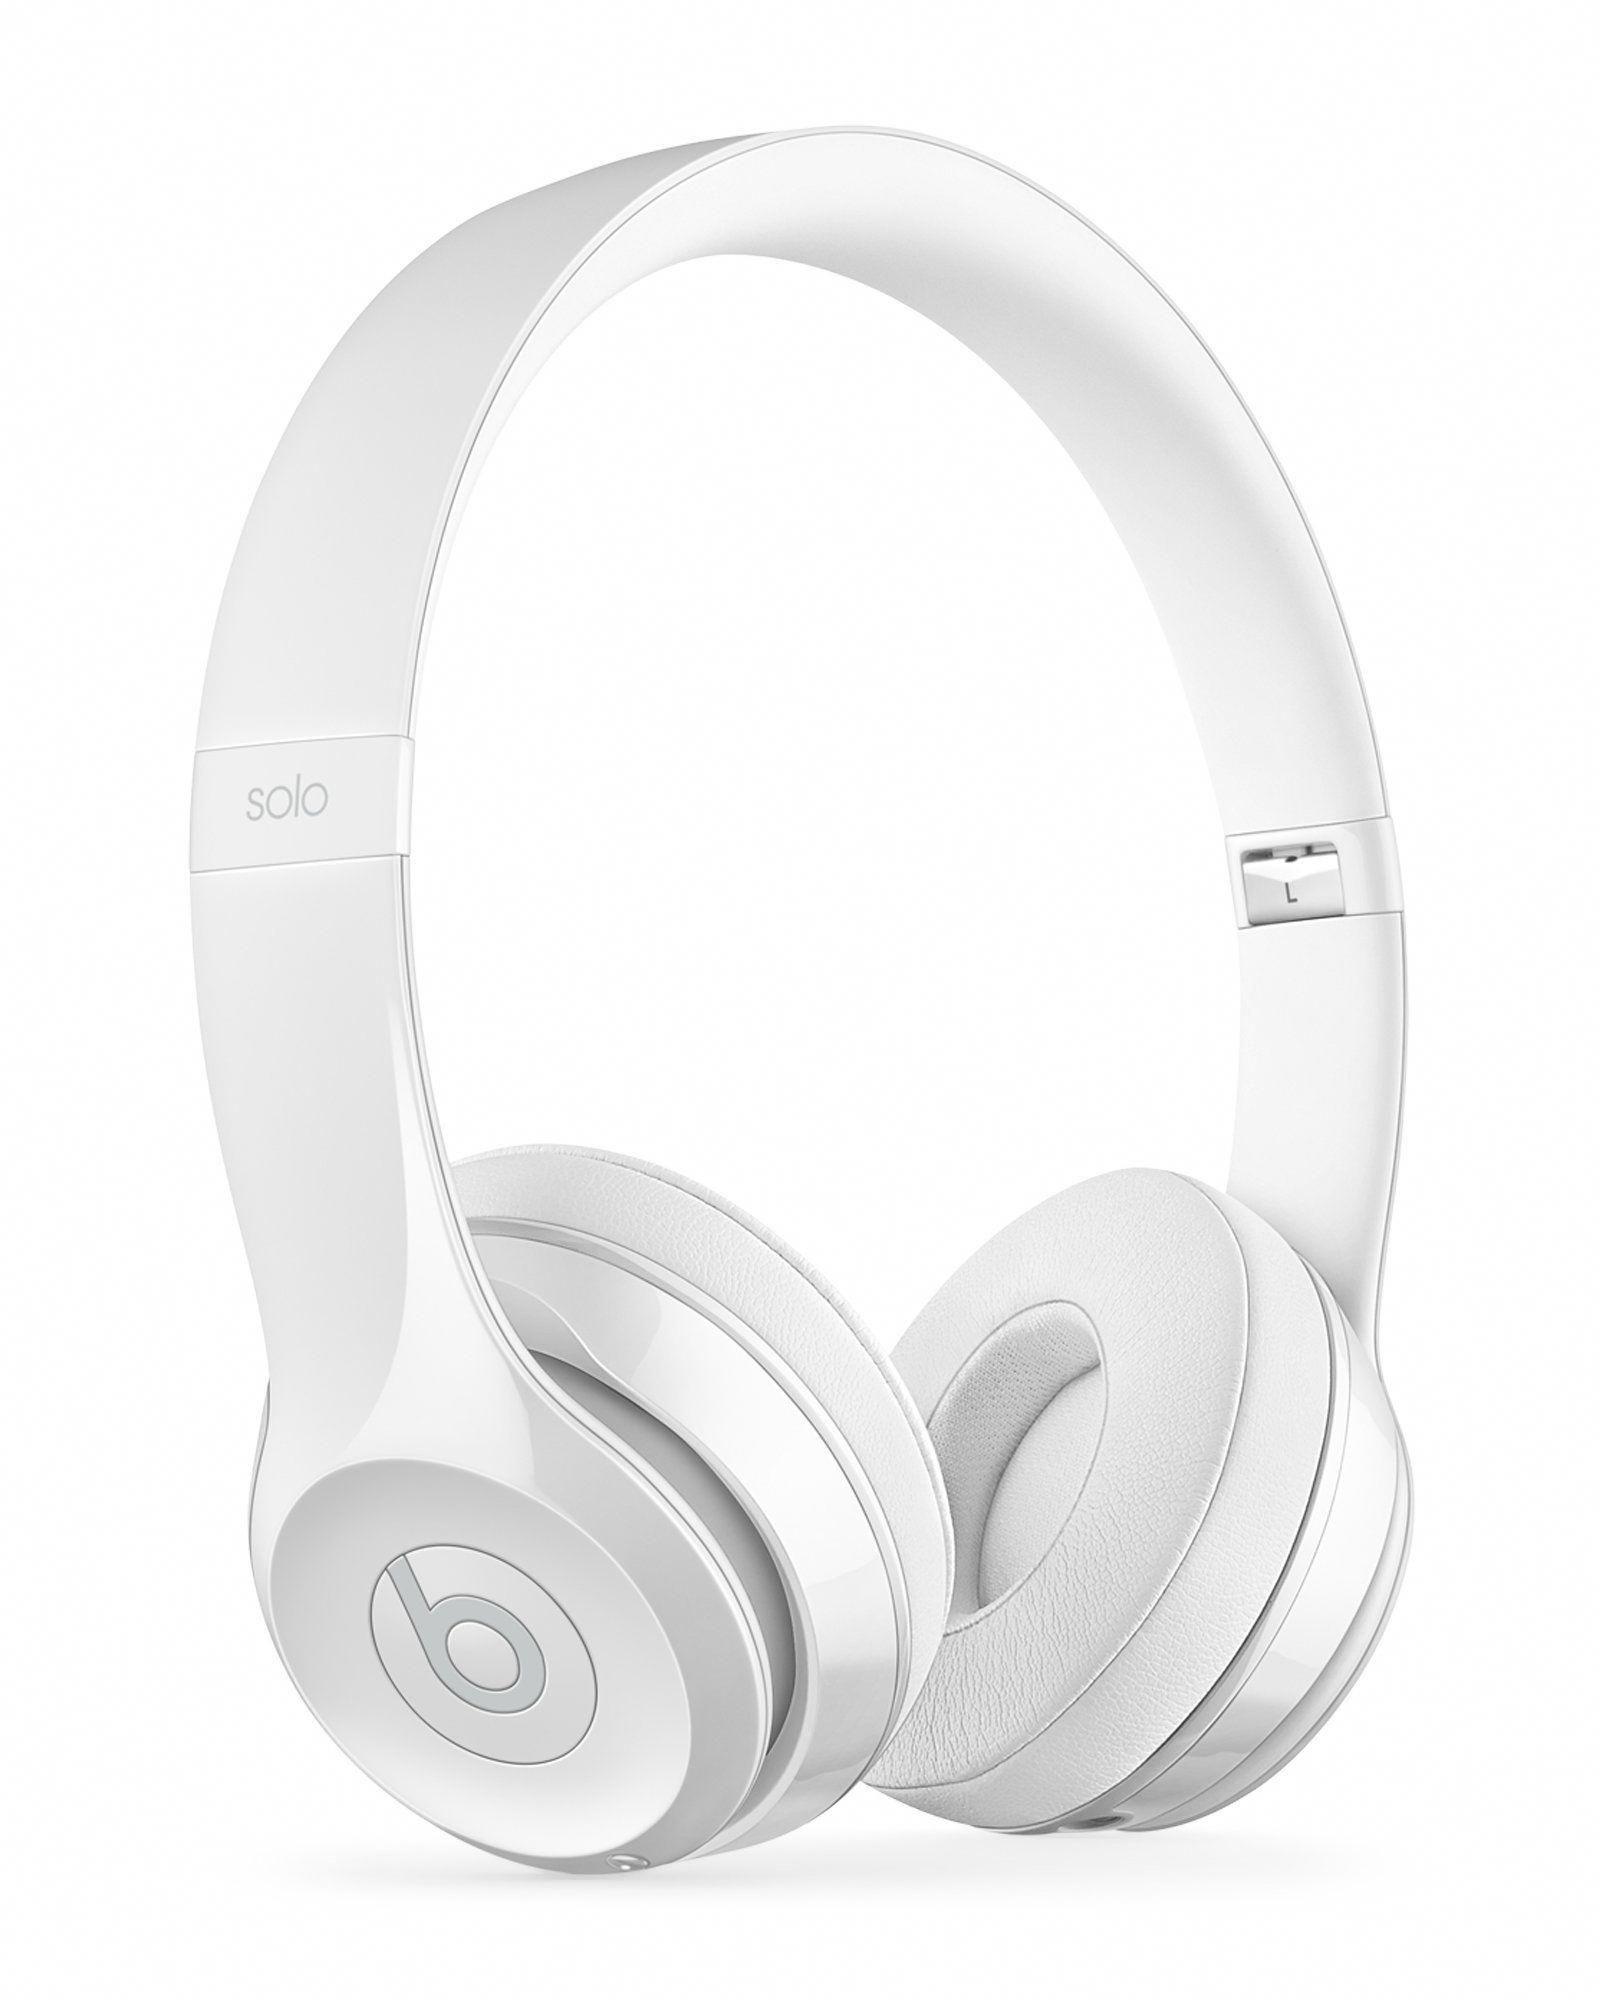 White Solo 3 Wireless Headphones Wireless beats, Beats